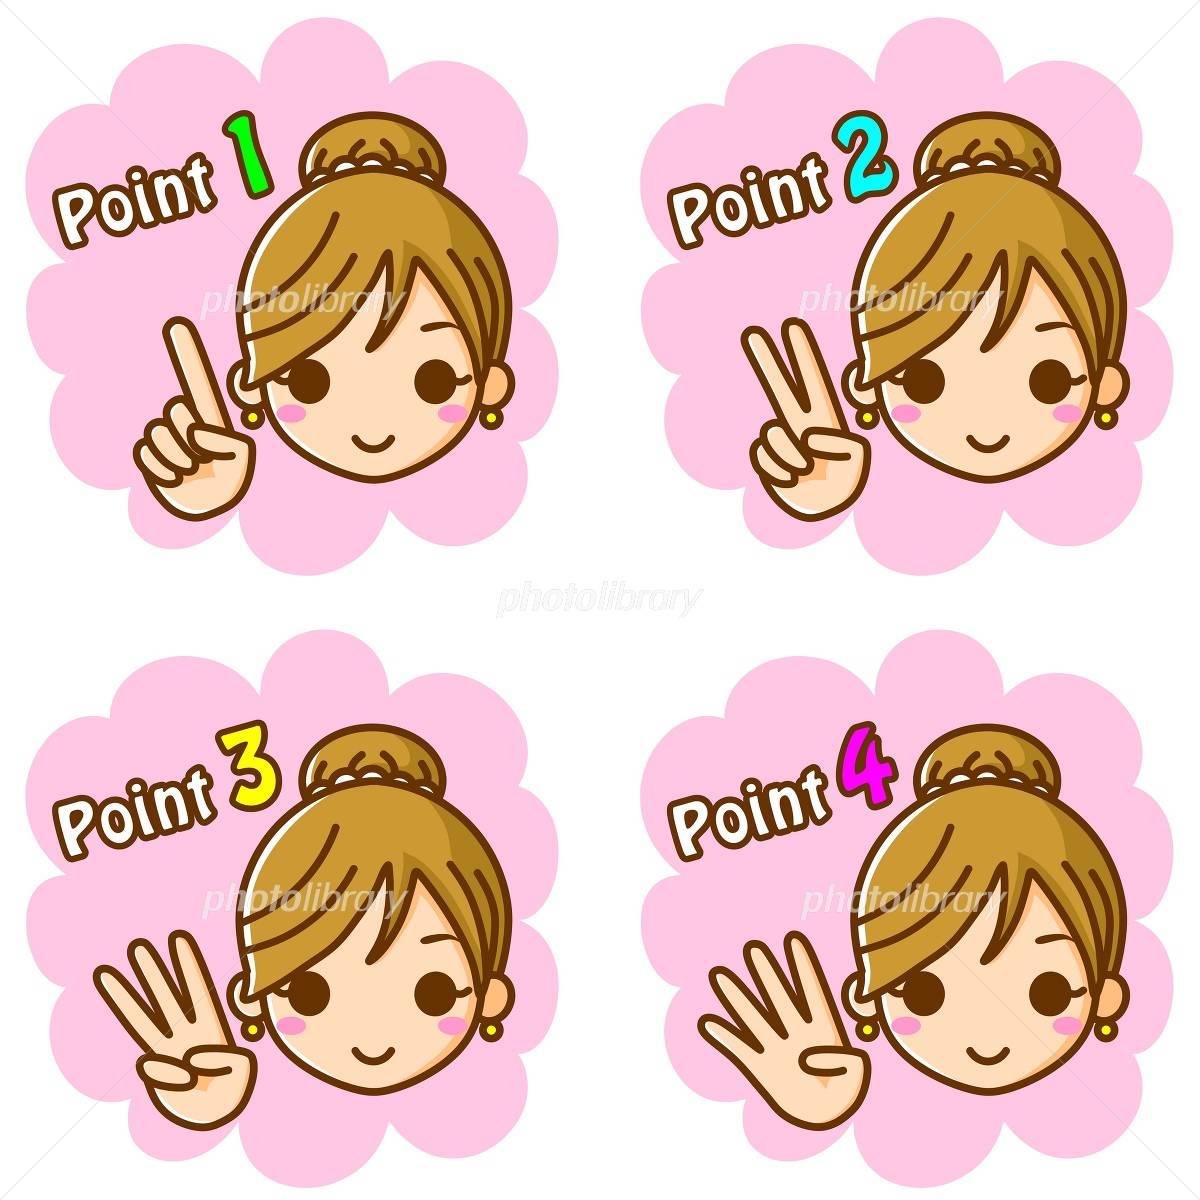 Female point イラスト素材